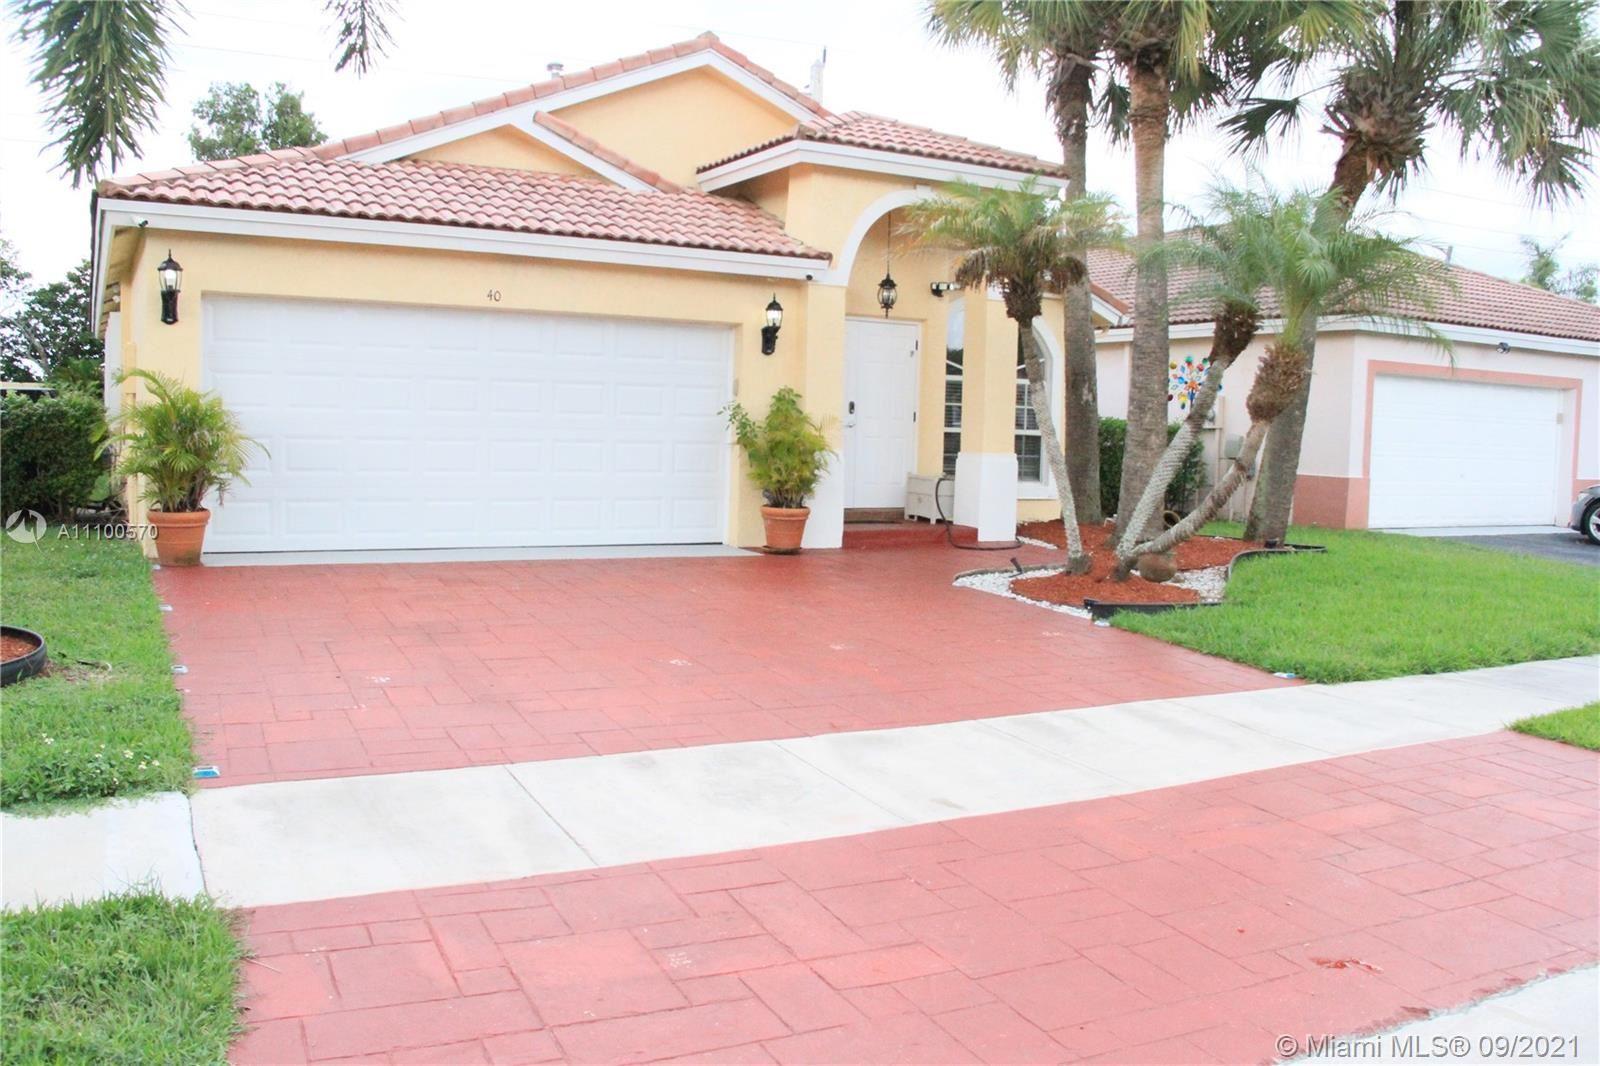 40 Gables Blvd, Weston, FL 33326 - #: A11100570